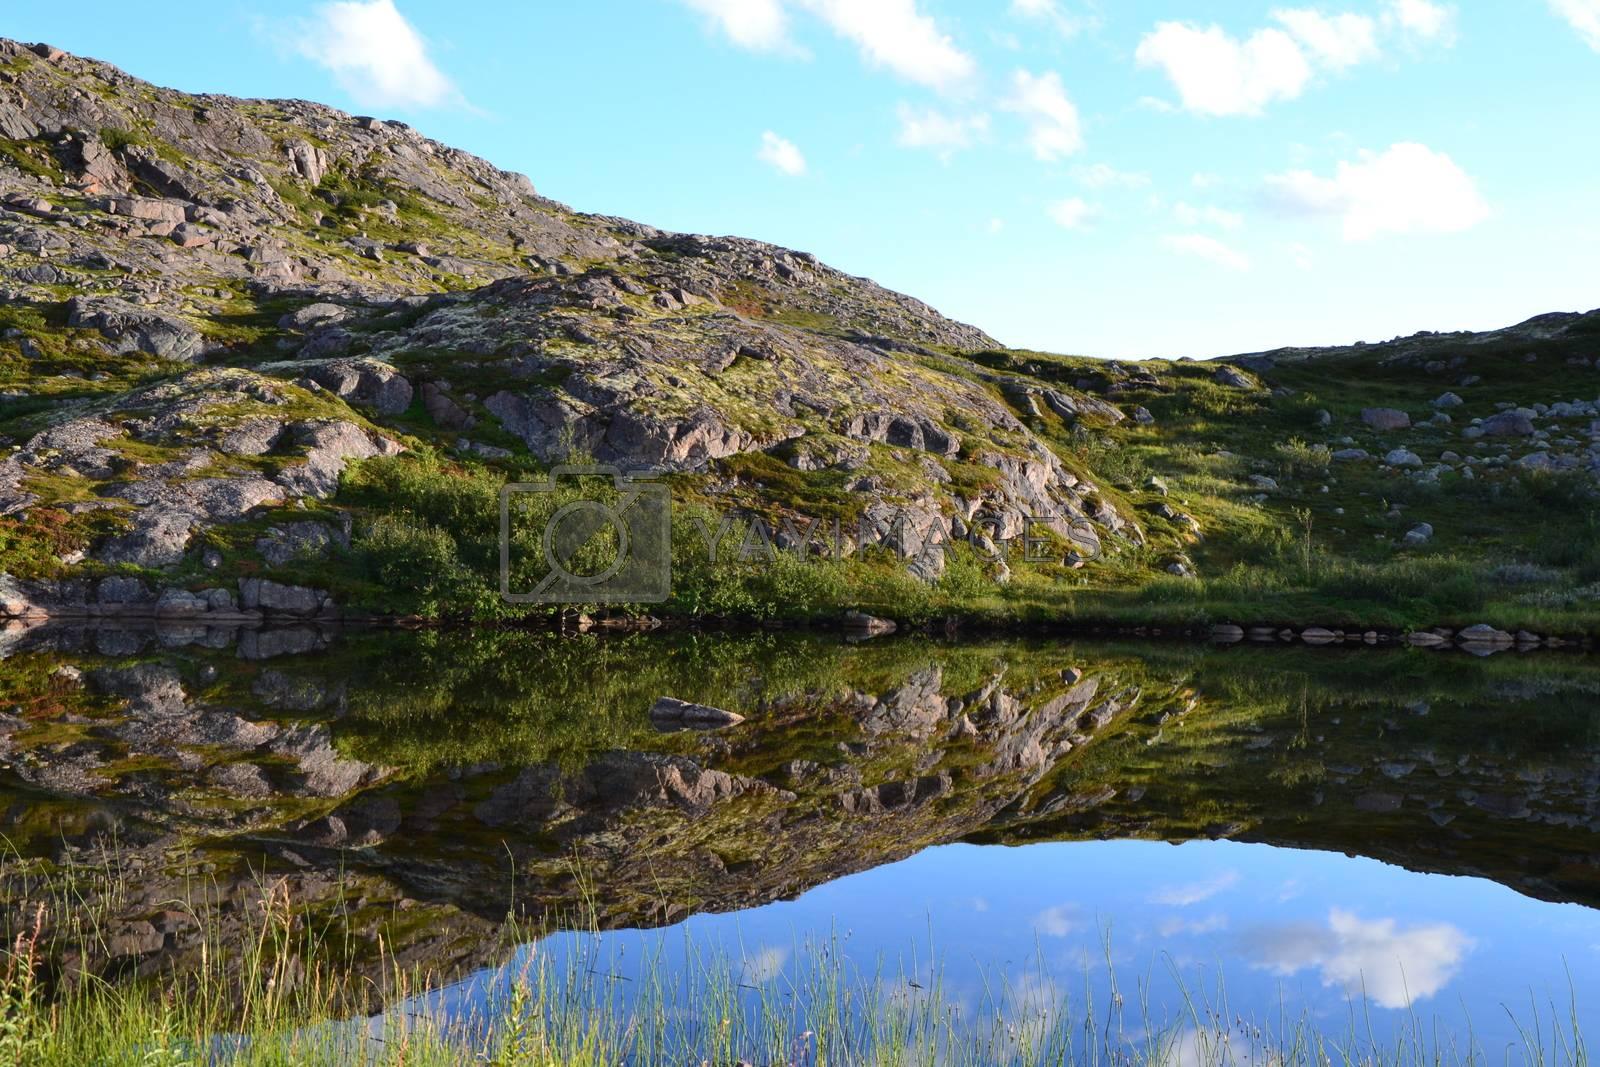 Royalty free image of Lake by ruv86